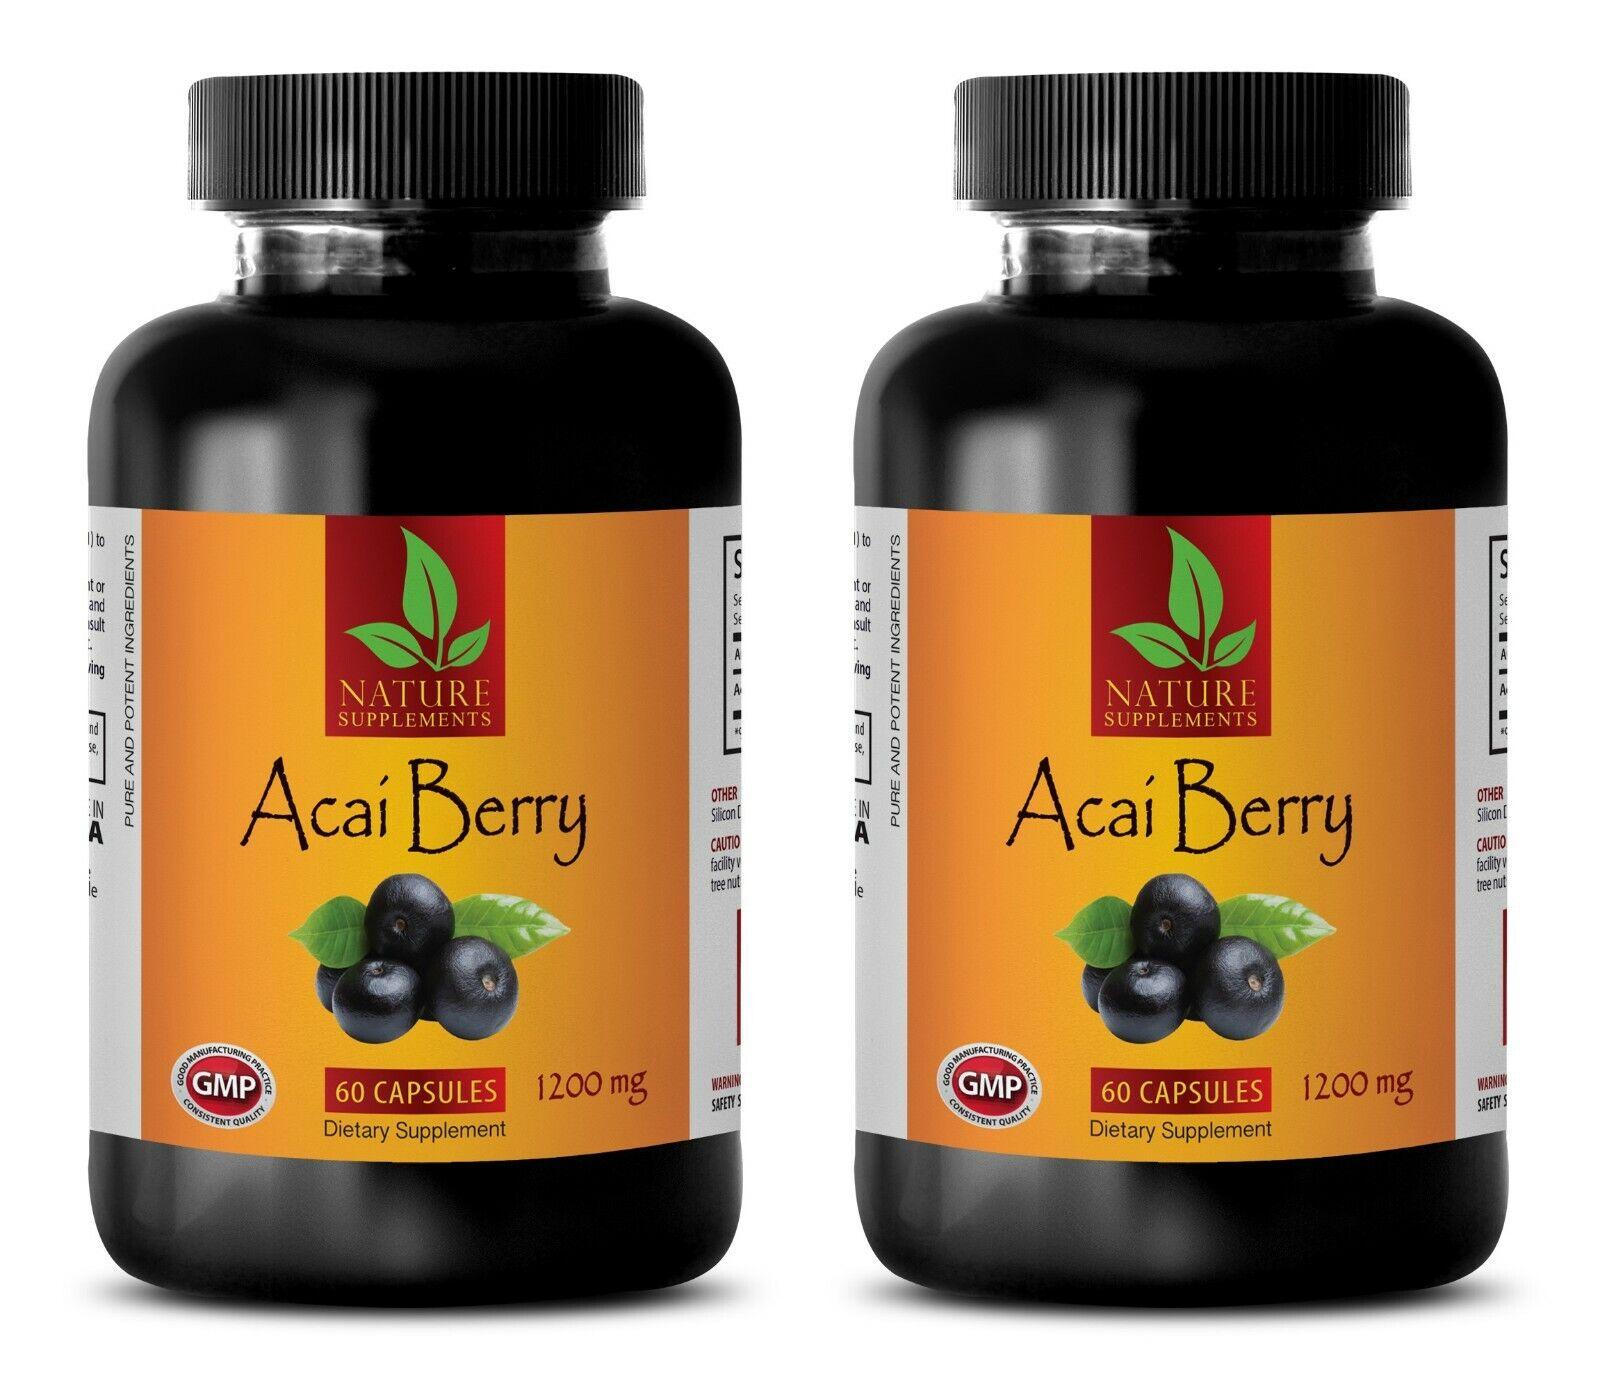 anti aging daily - ACAI BERRY 1200 - natural anti inflammatory supplements 2BOTT